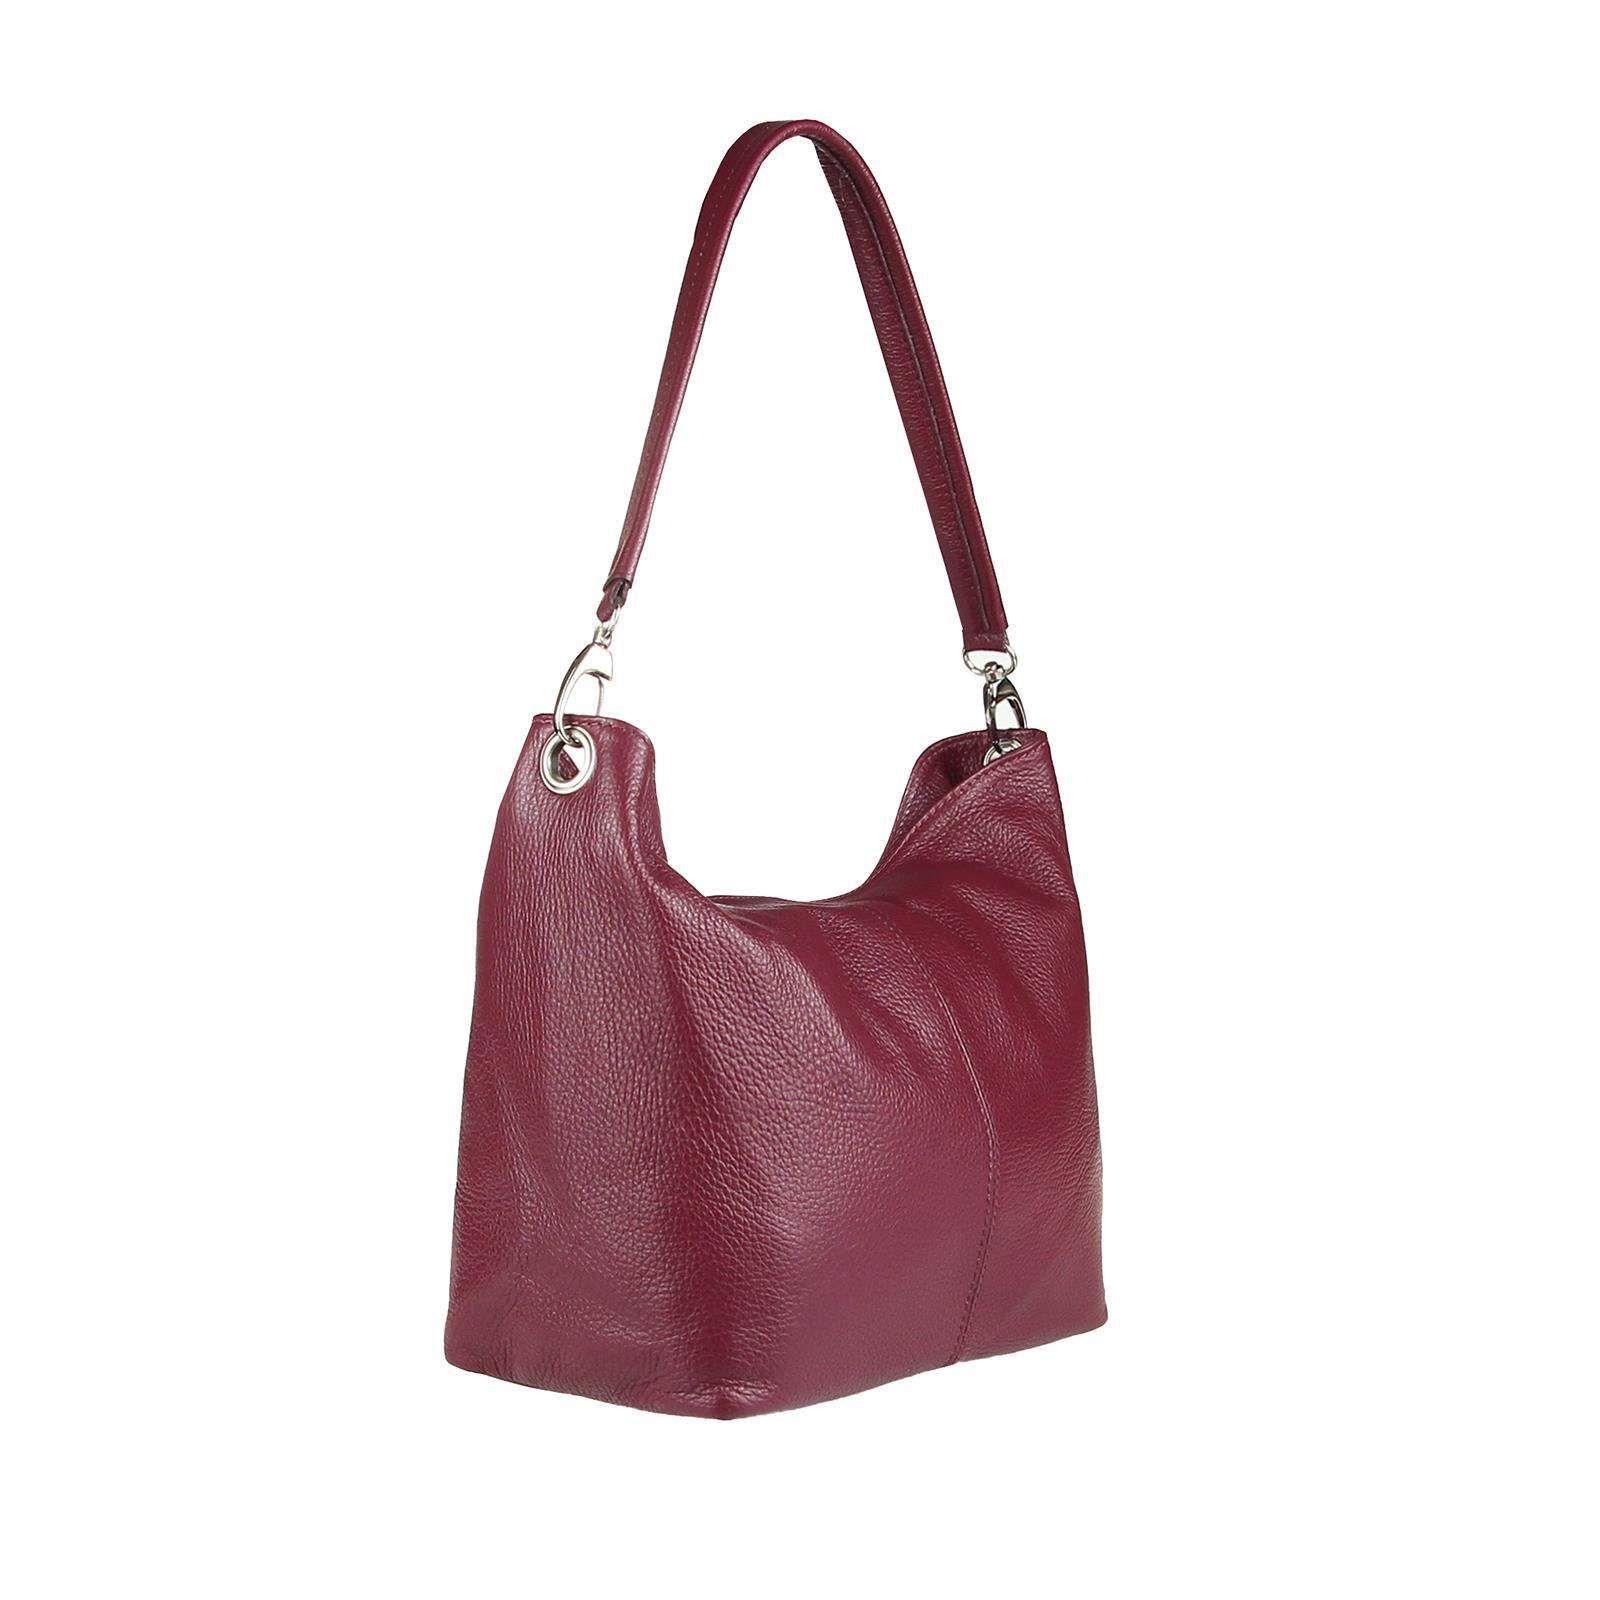 fe63ca6790b53 OBC Made in Italy DAMEN LEDER TASCHE SHOPPER Handtasche Hobo-Bags Schultertasche  Henkeltasche echt